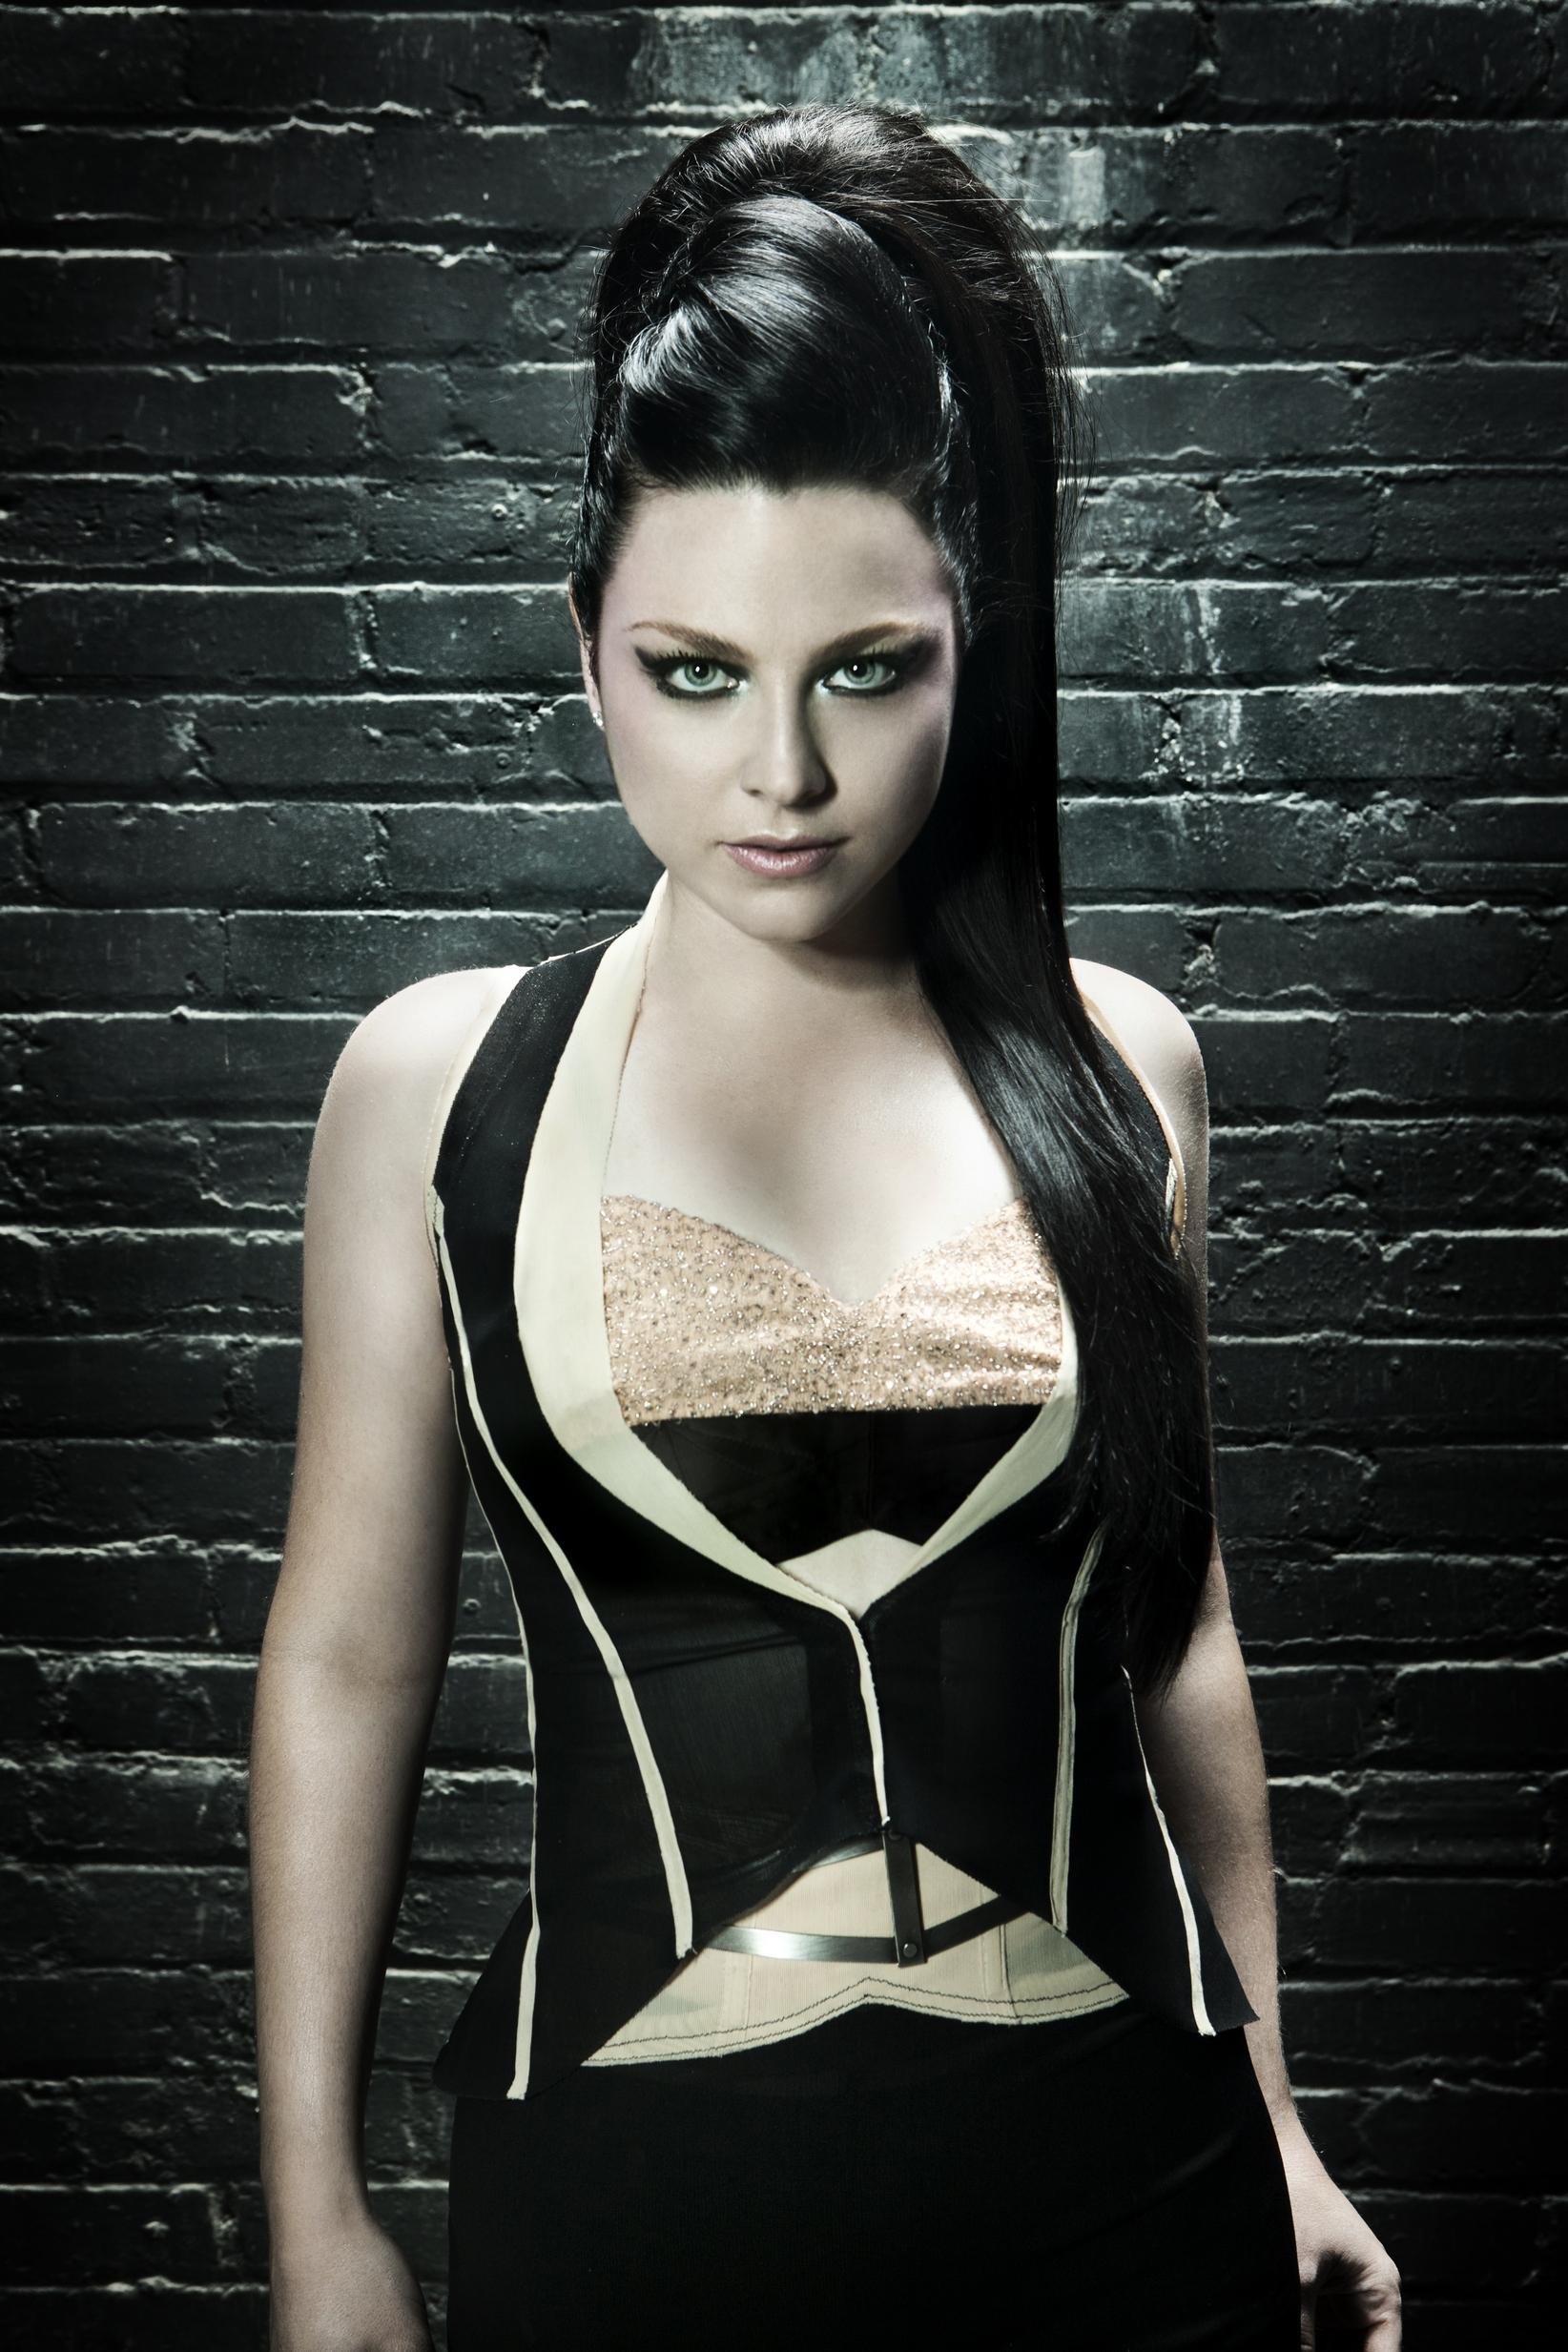 Amy Lee Gallery Evanescence Wiki Fandom Powered By Wikia